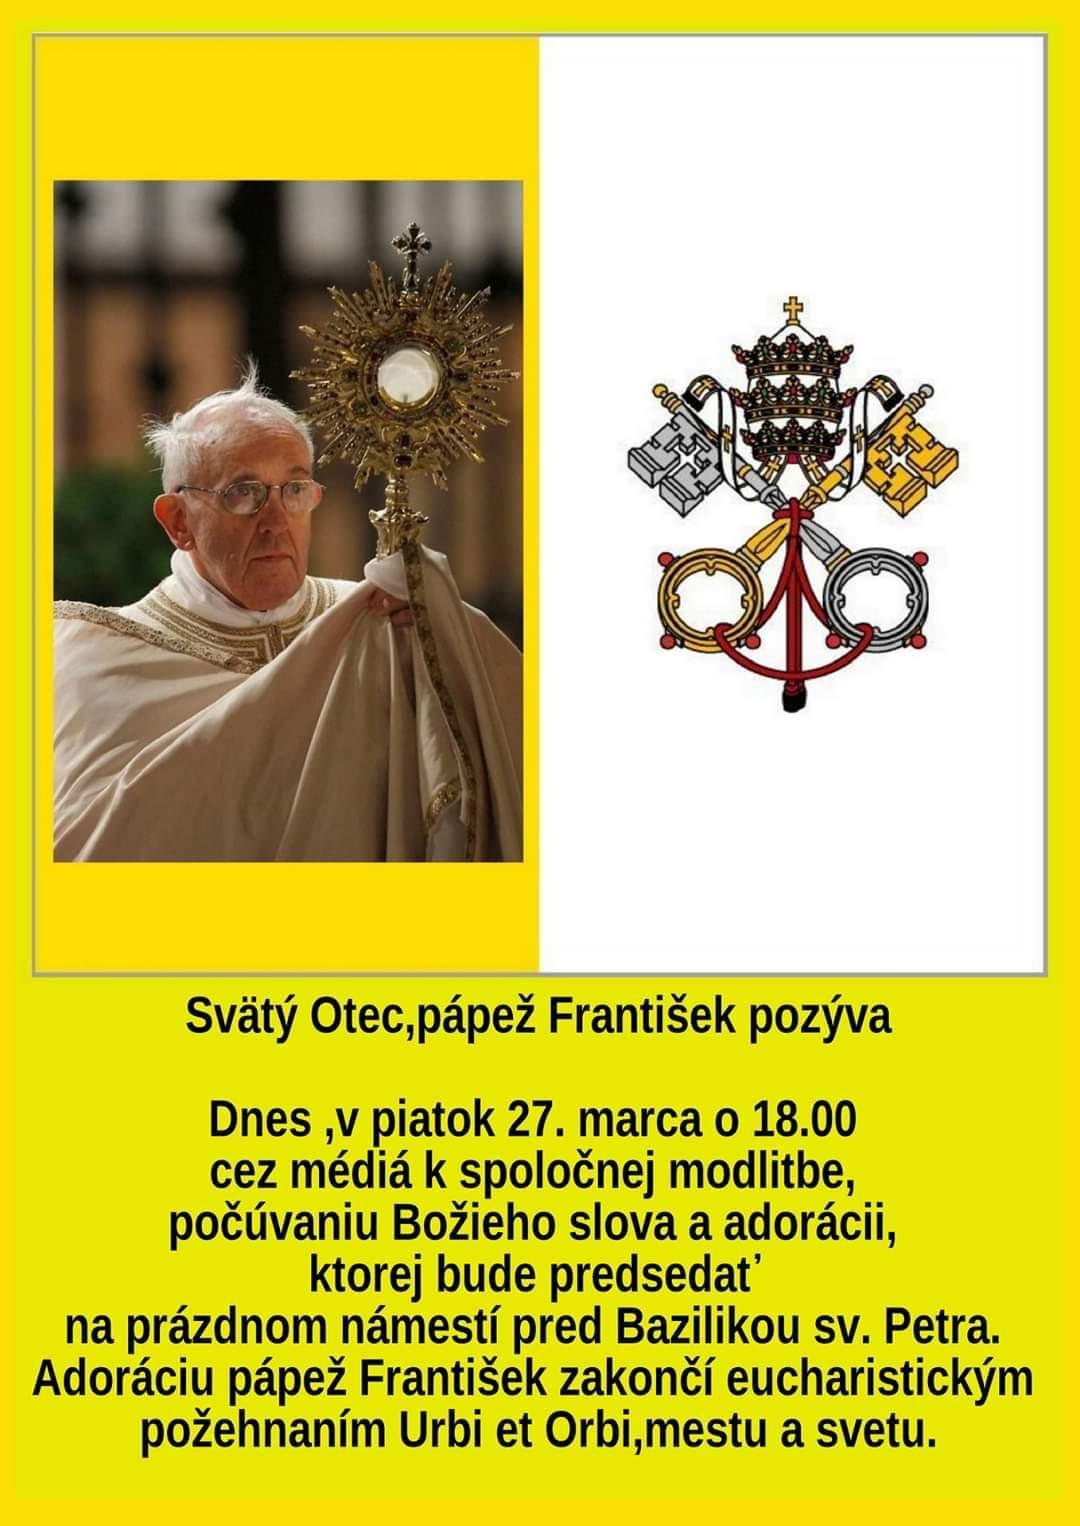 modlitba s papežom - koronavírus 2020